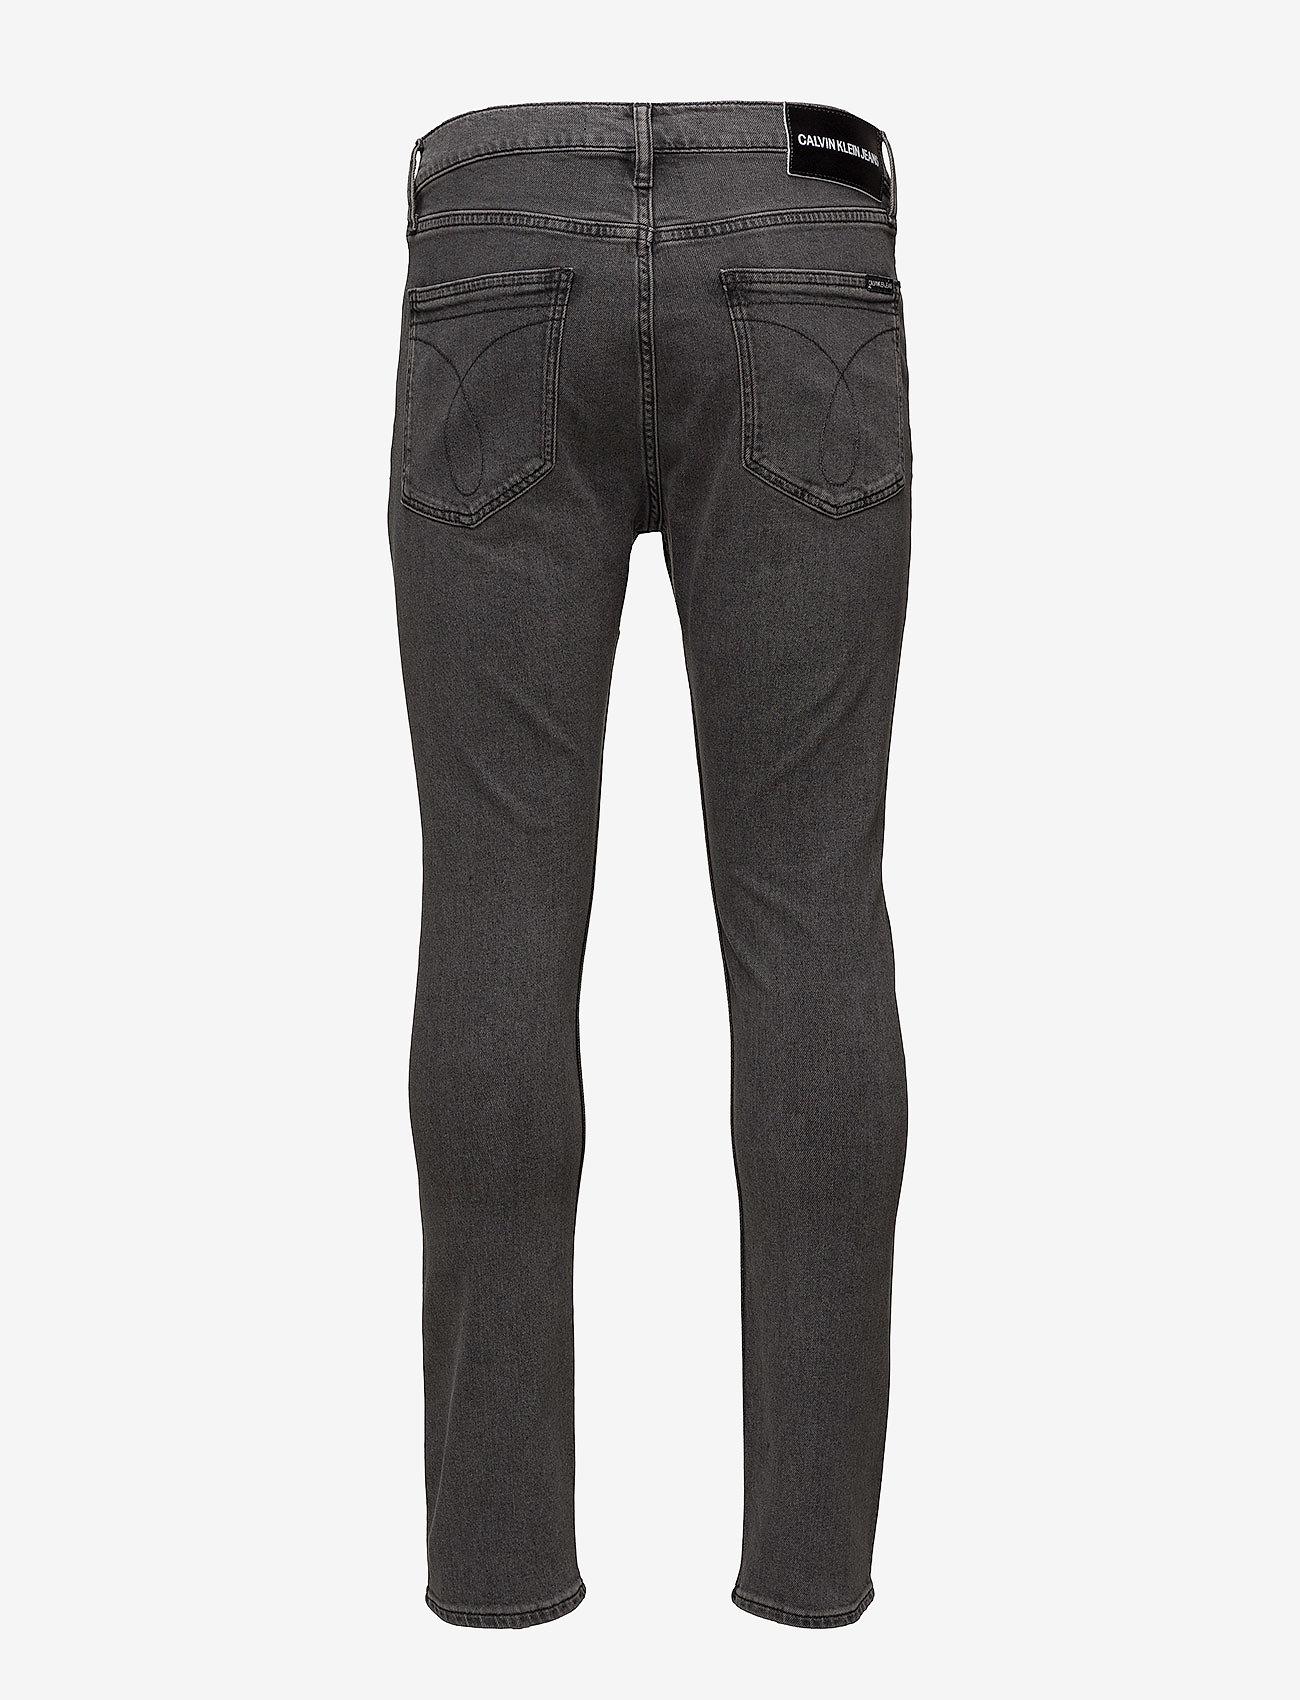 Calvin Klein Jeans - CKJ 016 SKINNY - skinny jeans - copenhagen grey - 1